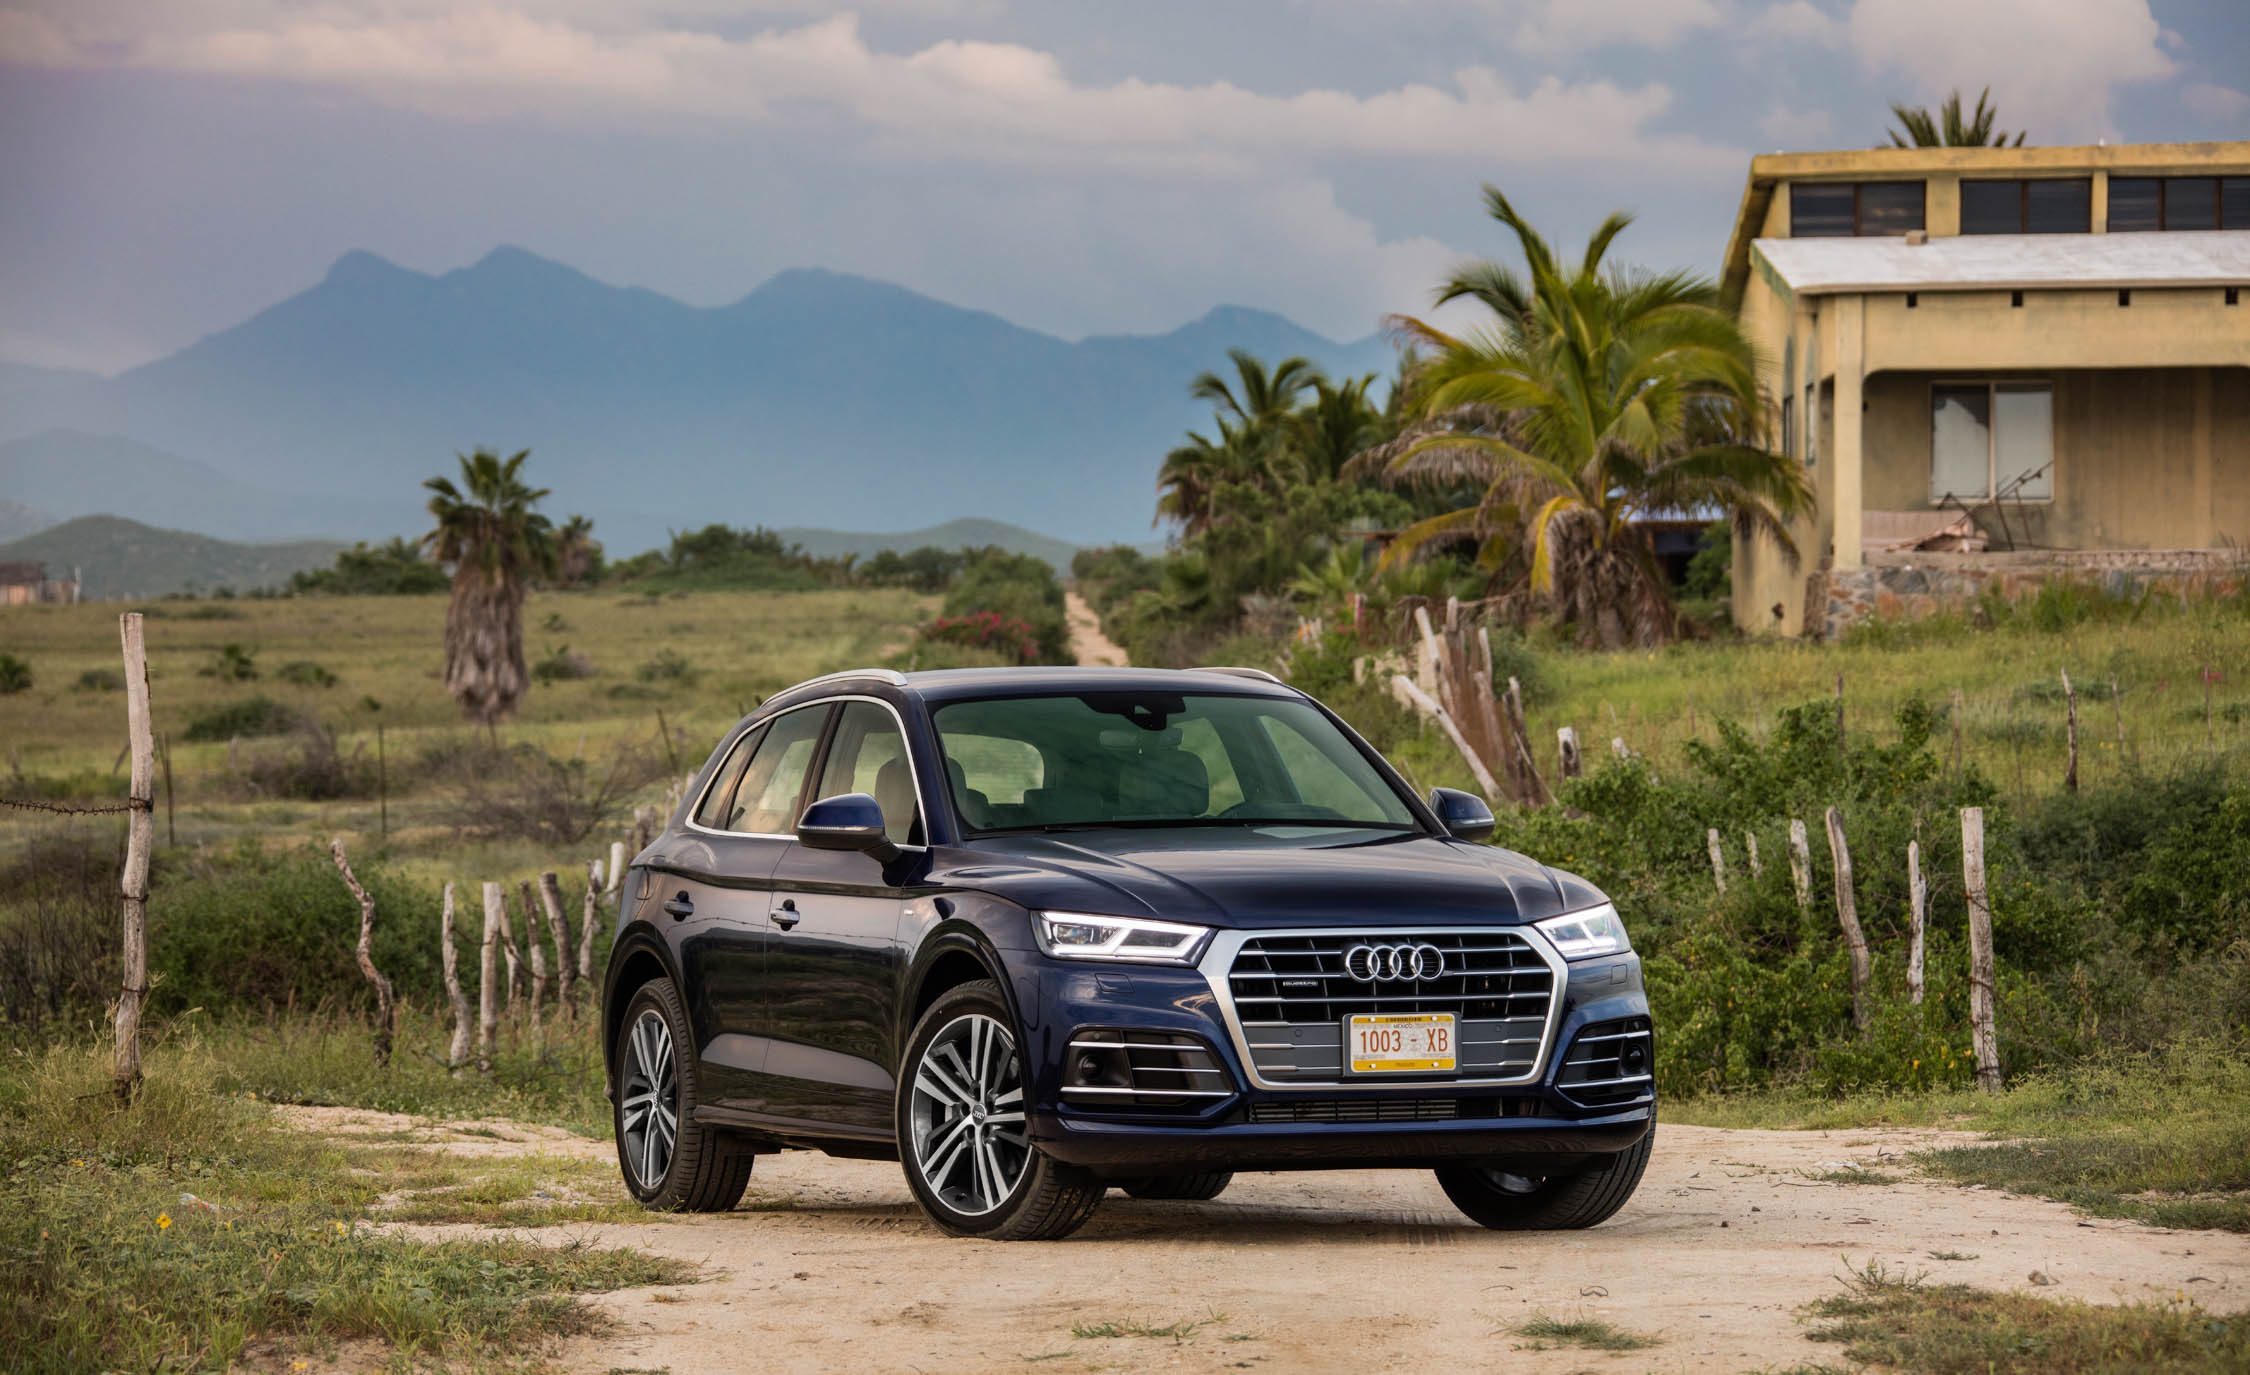 2018 Audi Q (View 25 of 40)